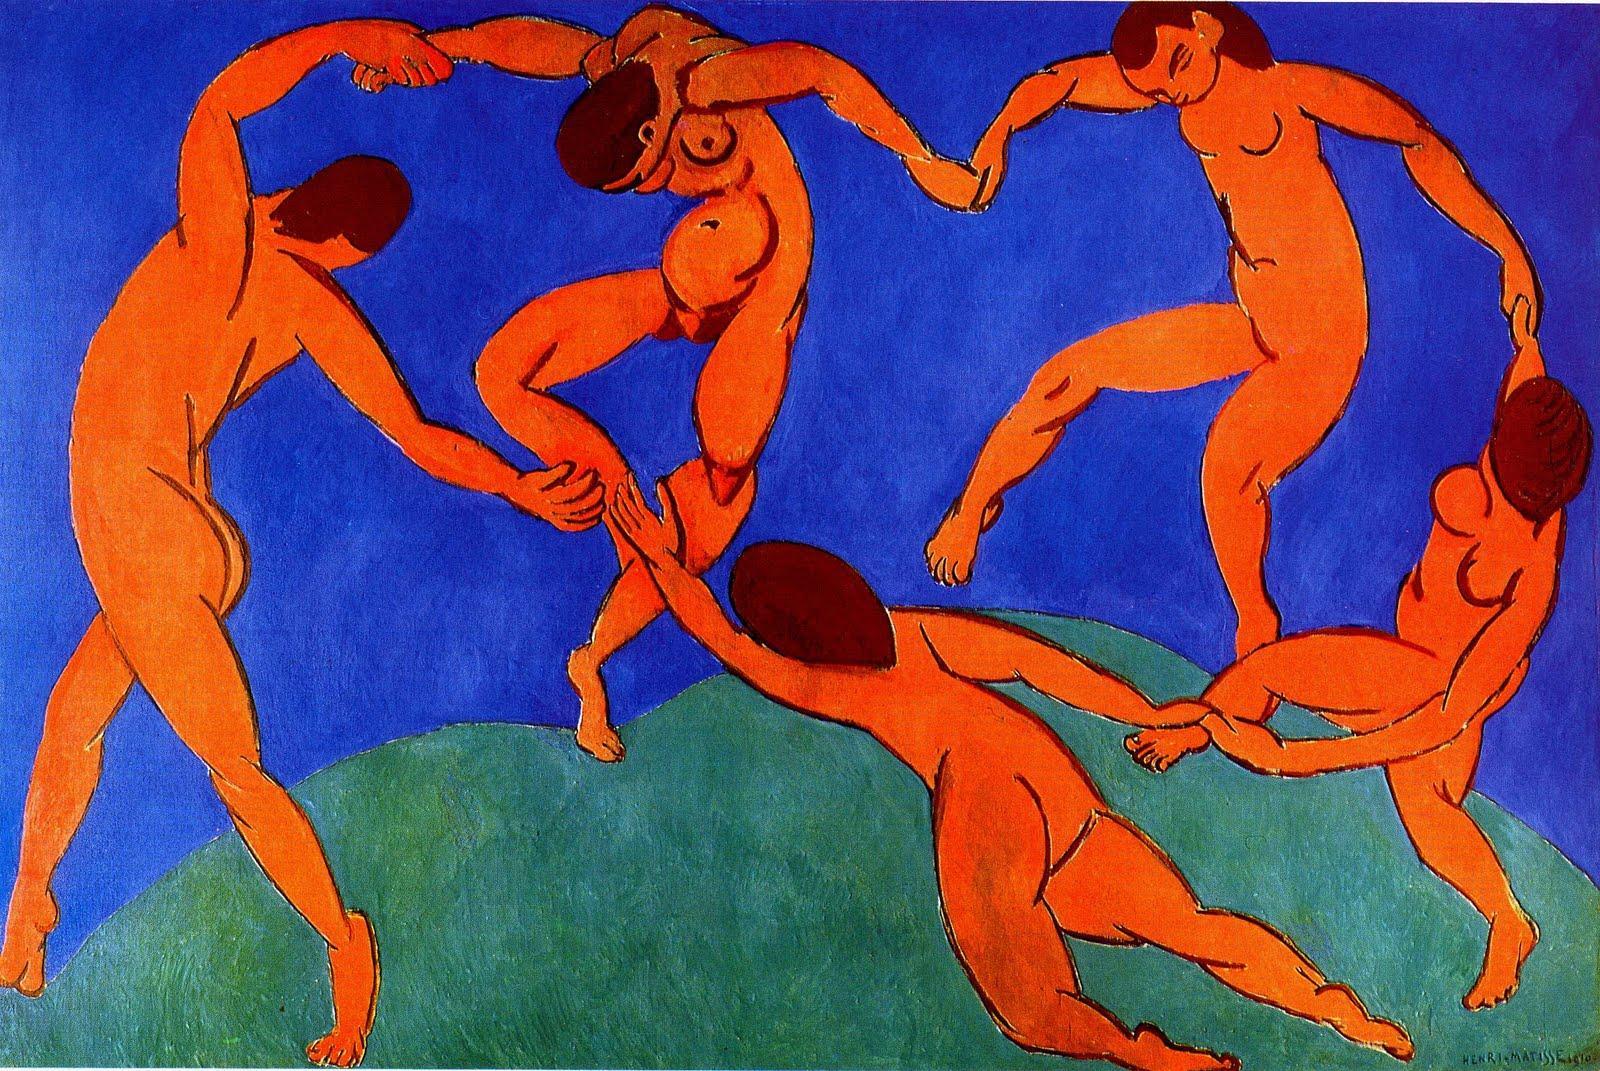 Image source www.studyblue.com Artist H. Matisse La Danse (1910)